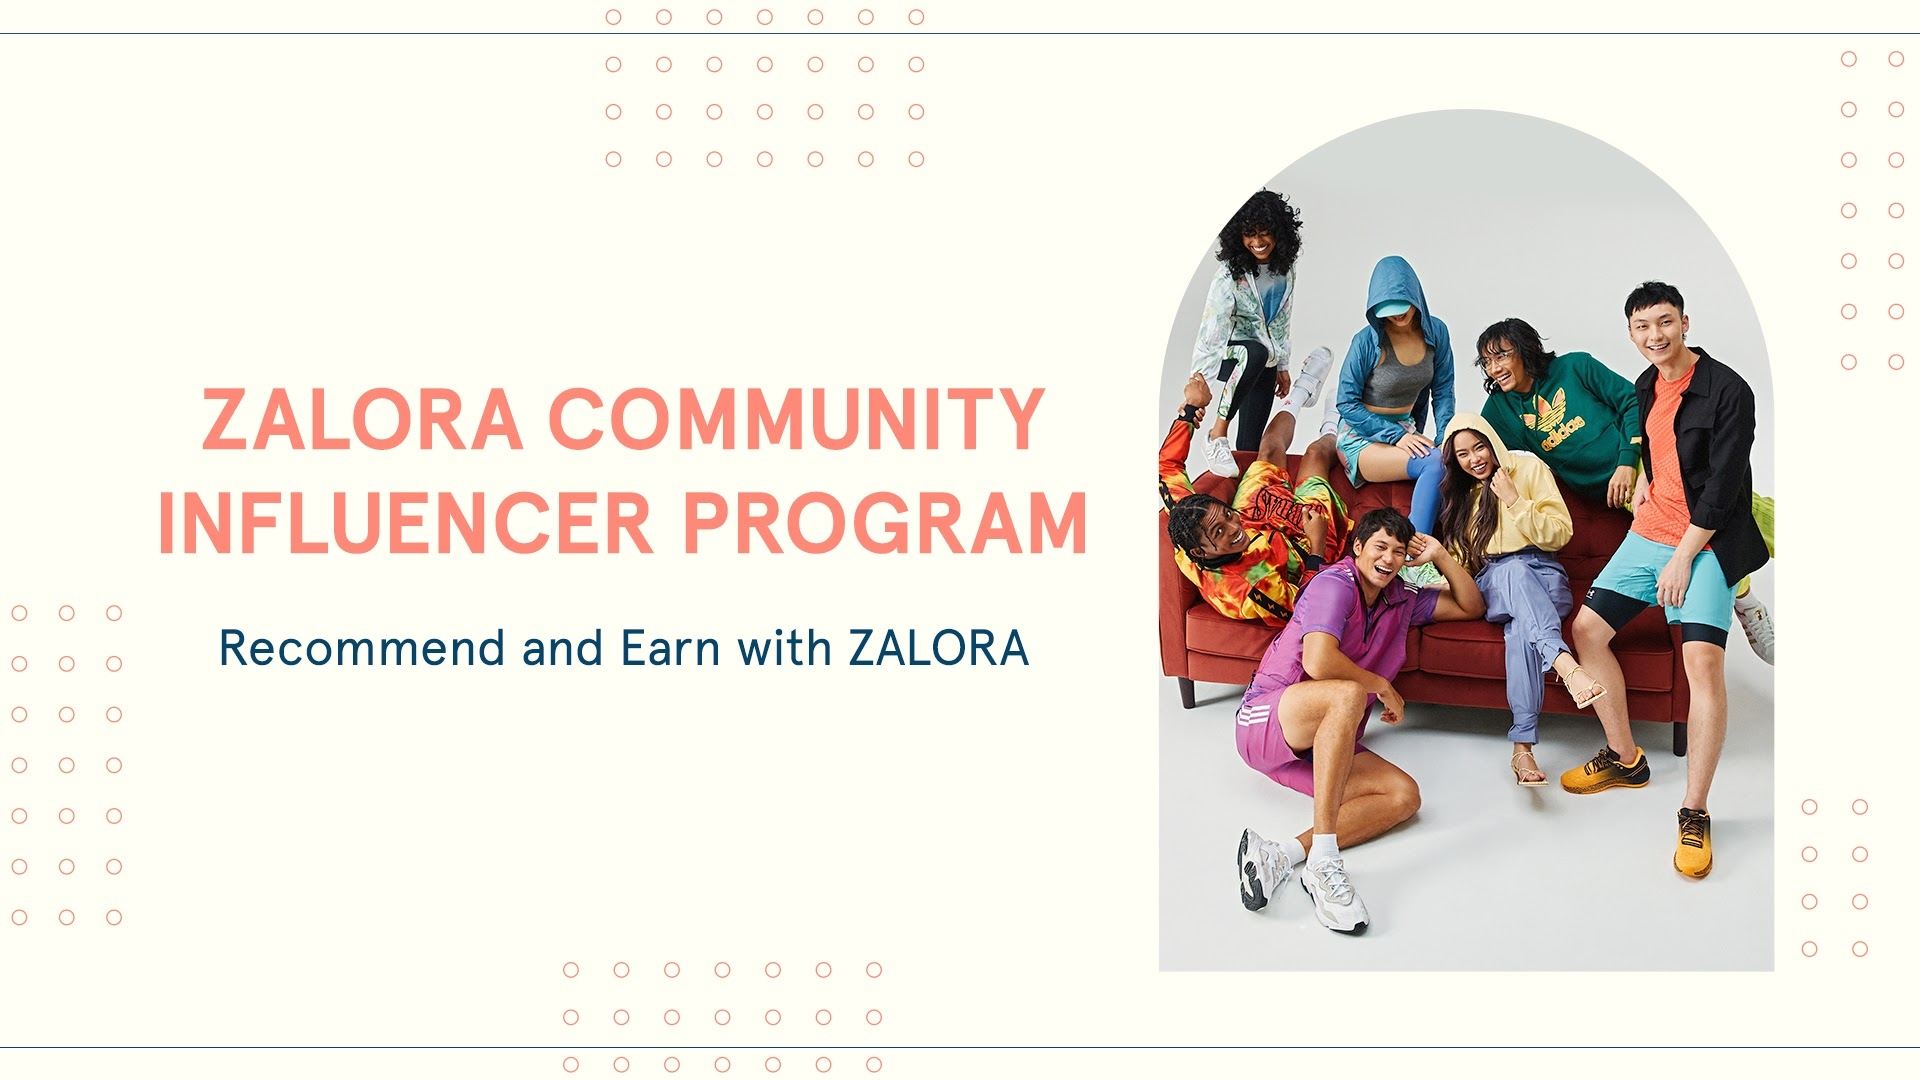 Lewat Program Community Influencer, ZALORA Ajak Masyarakat Naikan Pendapatan di Masa Pandemi